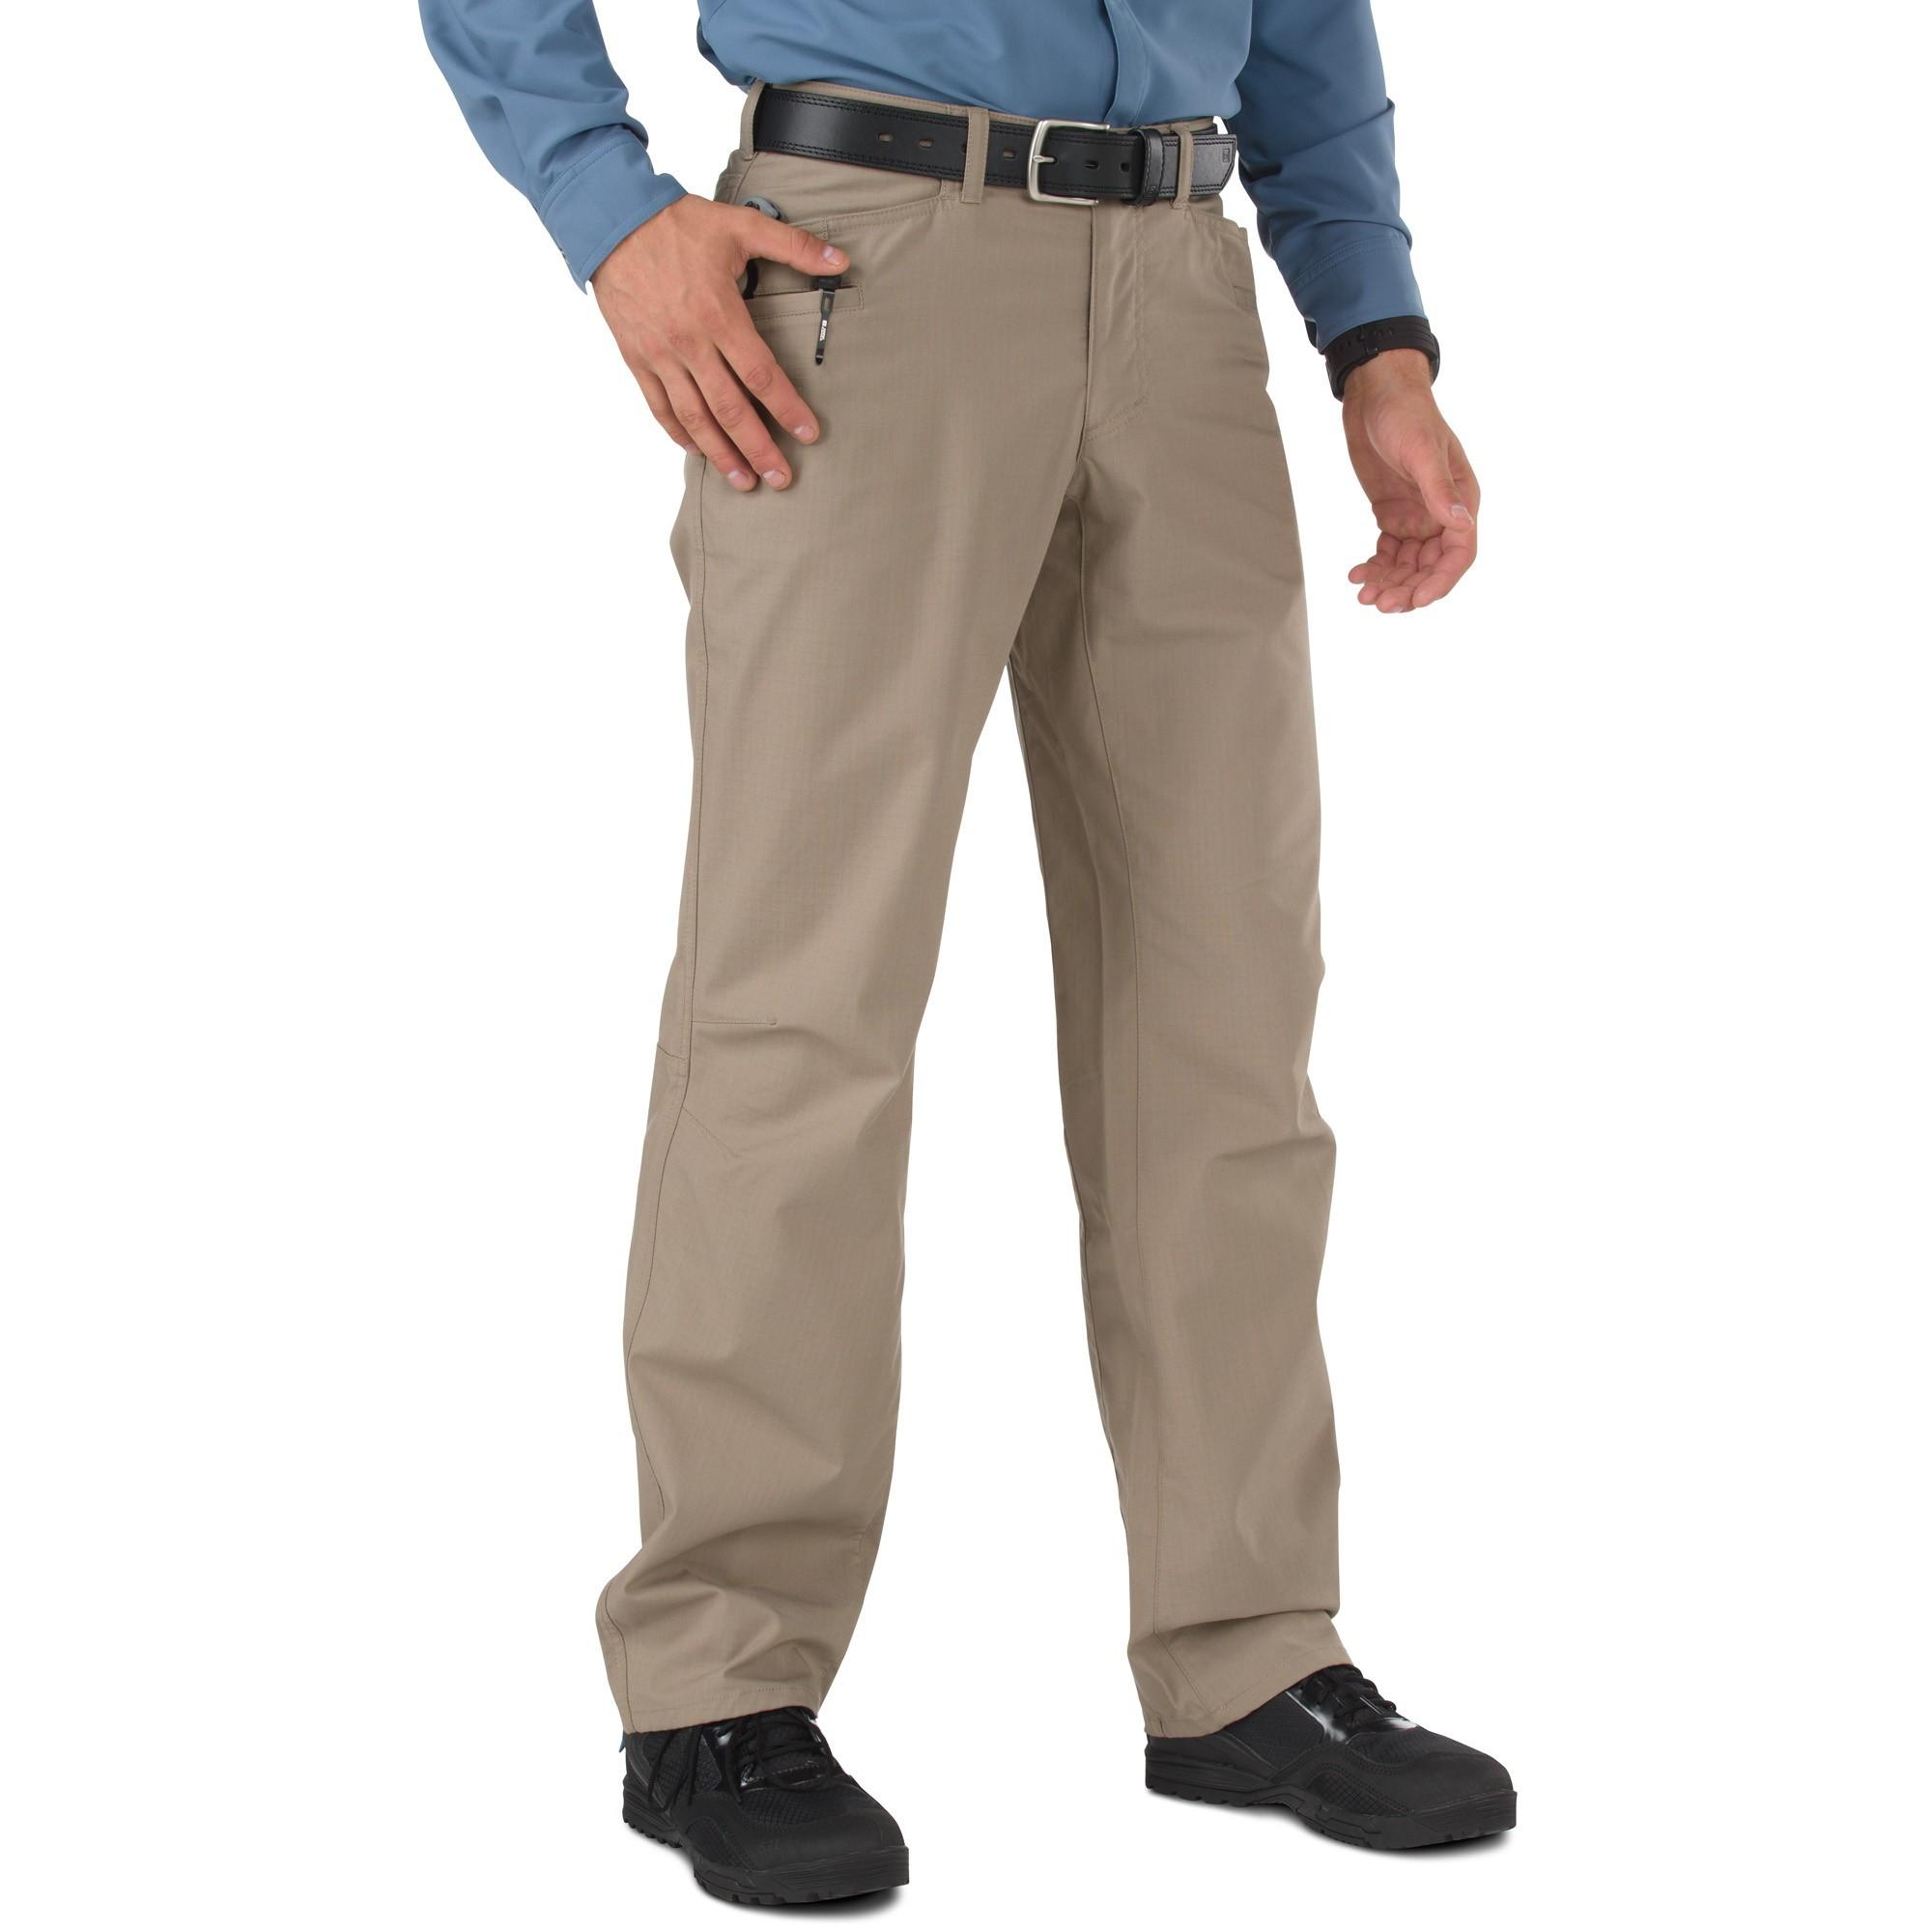 5.11 Tactical Ridgeline Pant